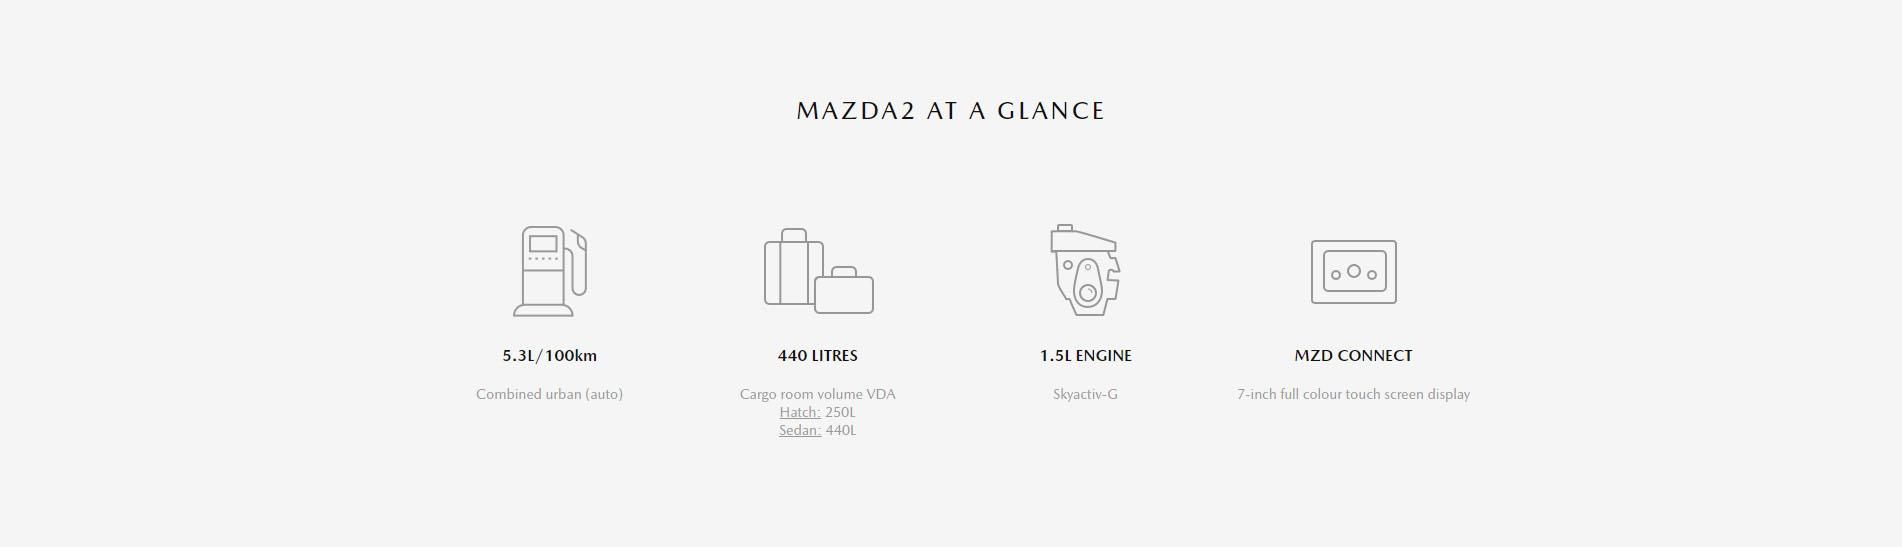 Mazda2-at-a-glance